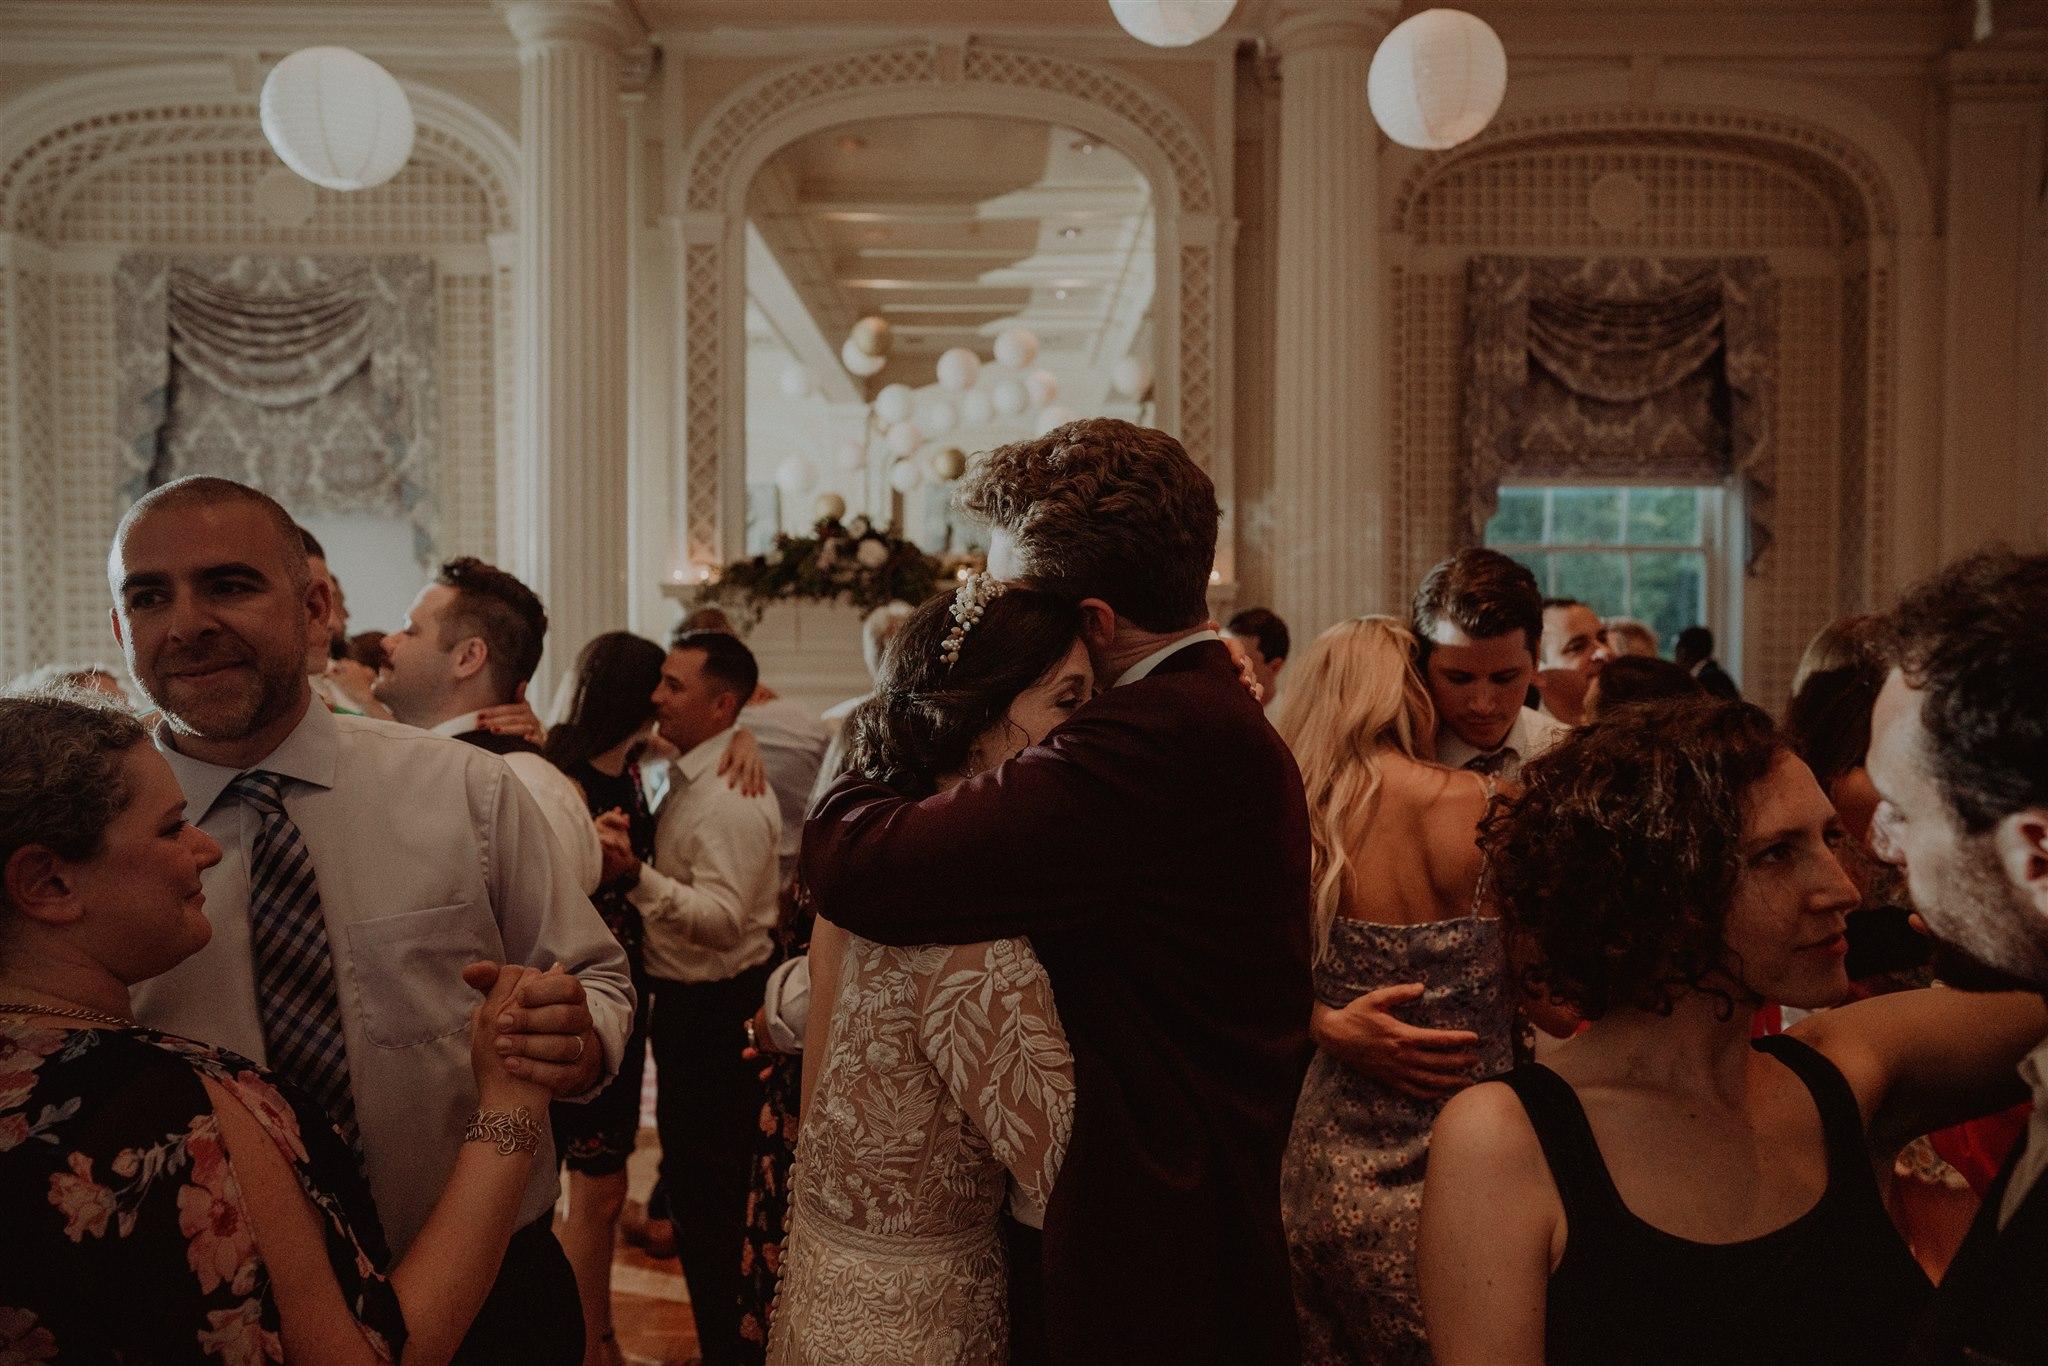 Chellise_Michael_Photography_Hudson_Valley_Wedding_Photographer_Otesaga_Hotel-6185.jpg